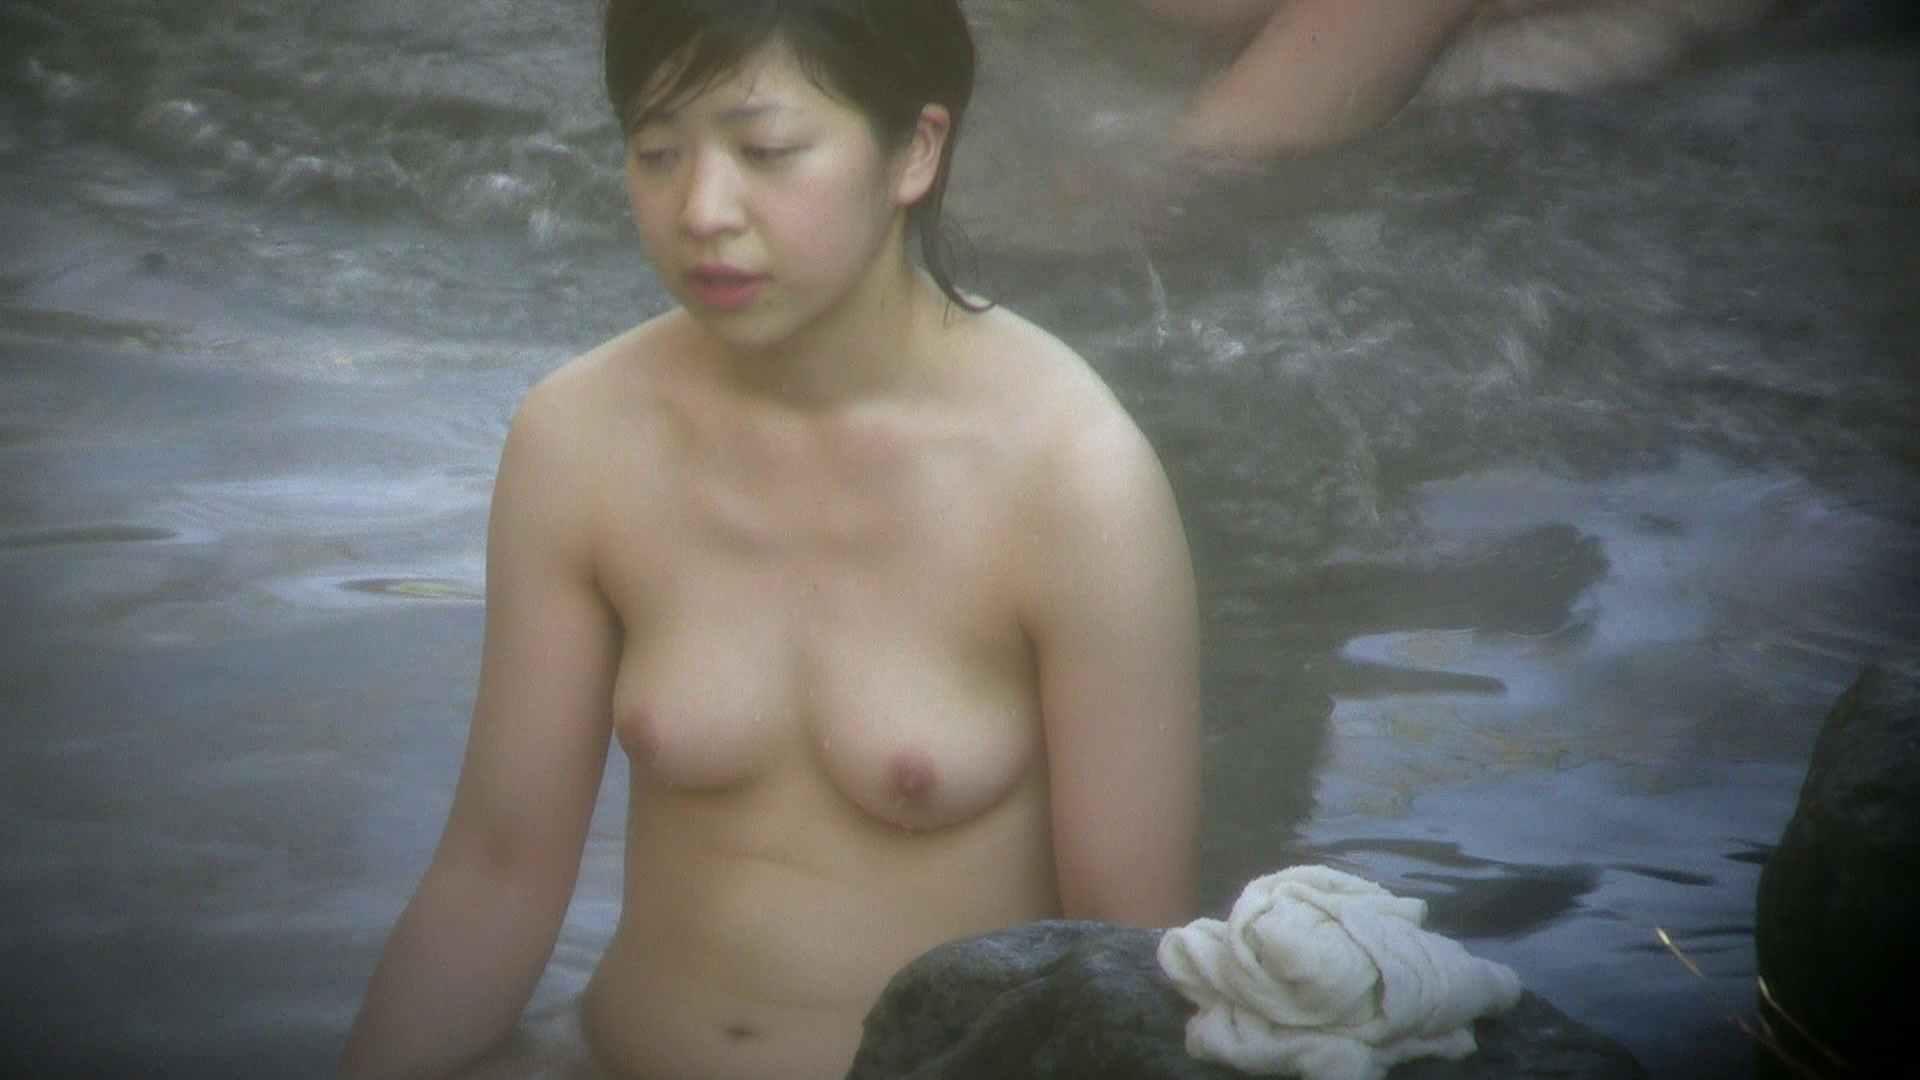 高画質露天女風呂観察 vol.005 OLのエロ生活 | 高画質  54連発 8